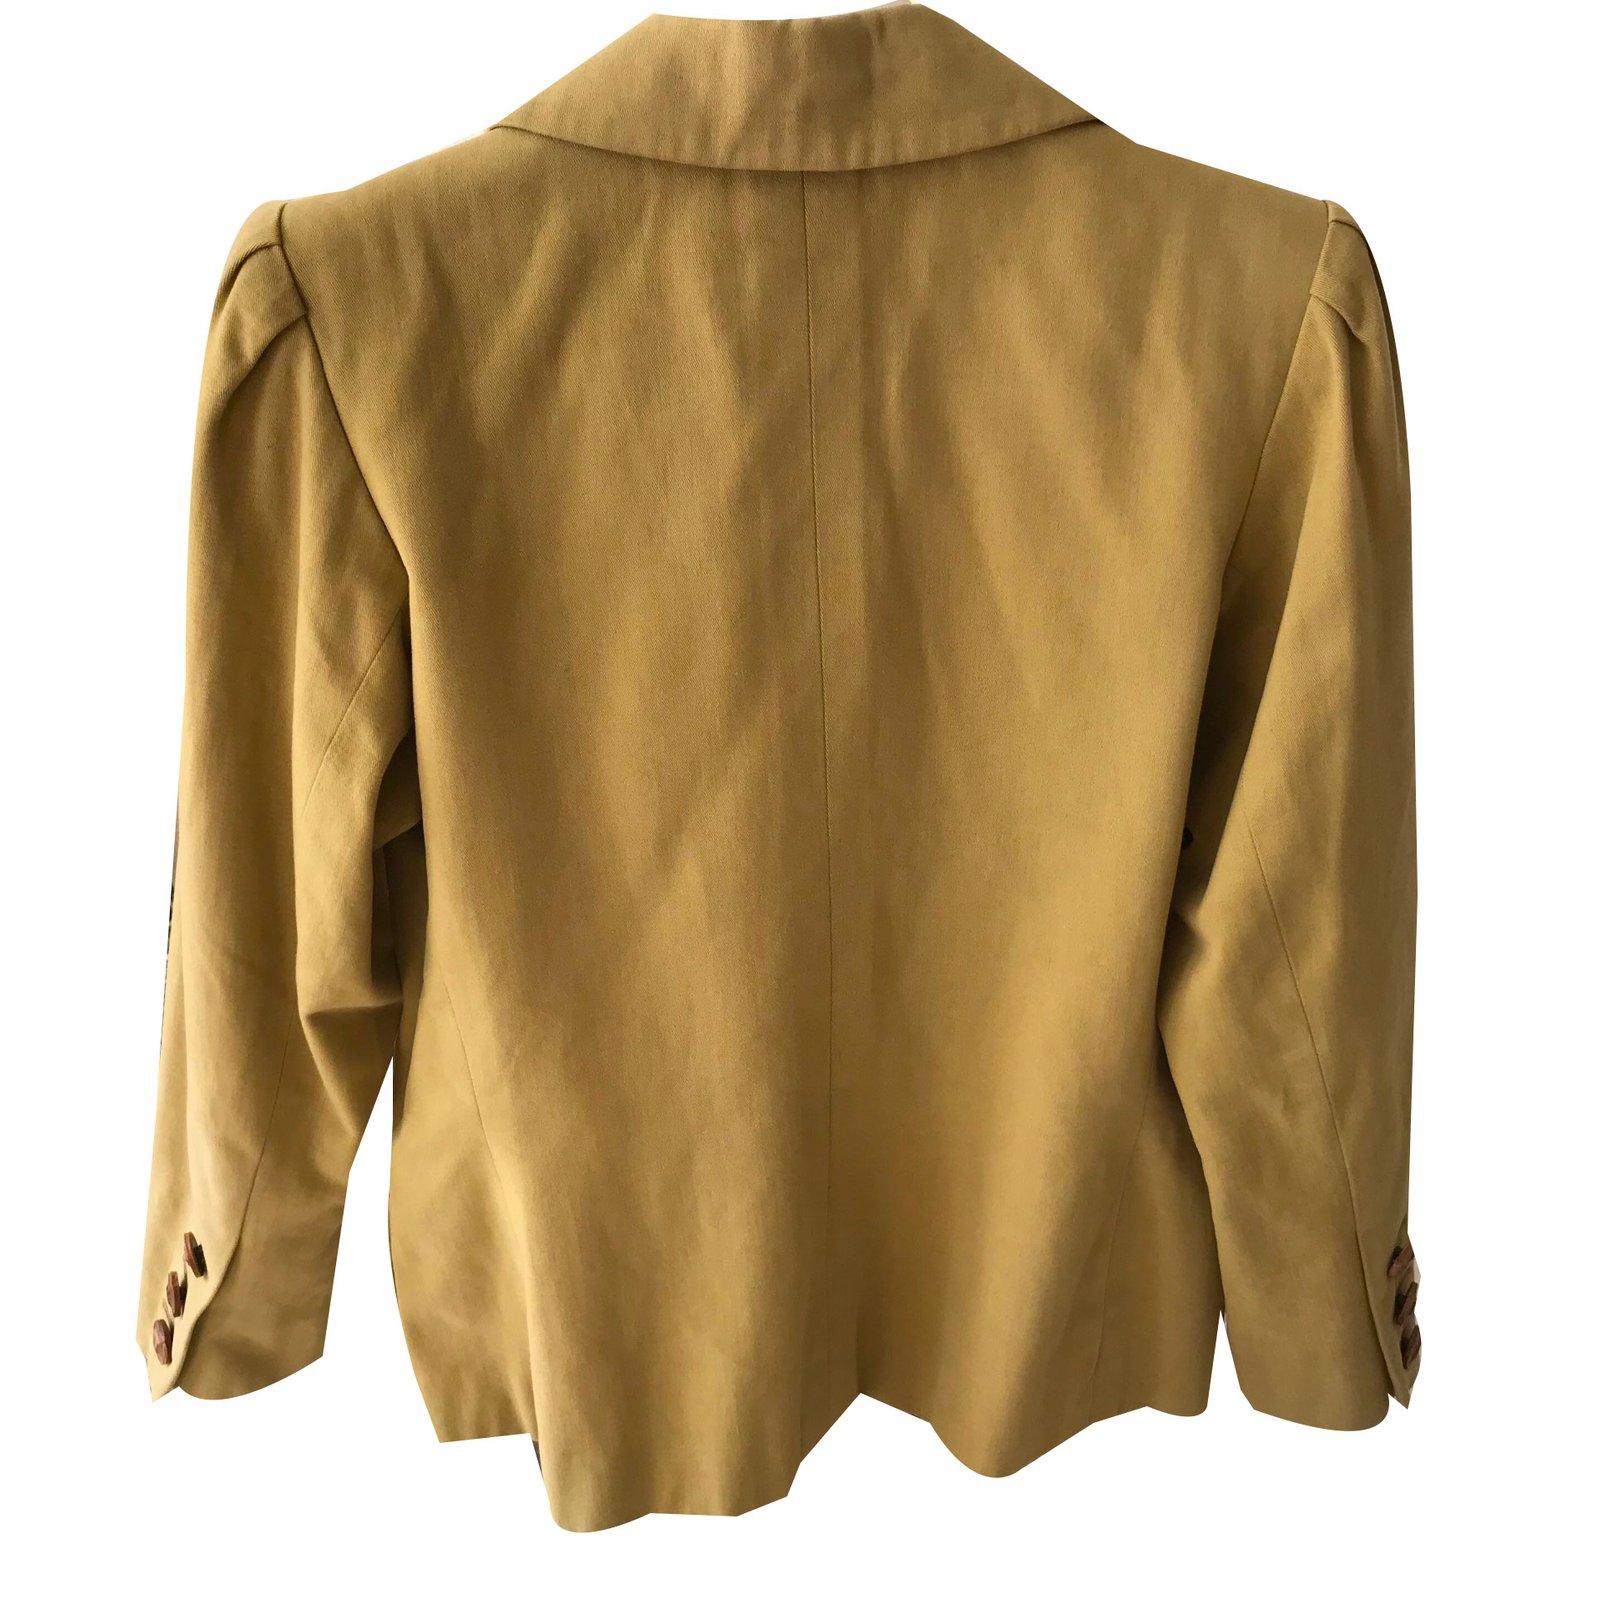 a7b588905ef Yves Saint Laurent YVES ST LAURENT RIVE GAUCHE Jackets Cotton Khaki  ref.57197 - Joli Closet